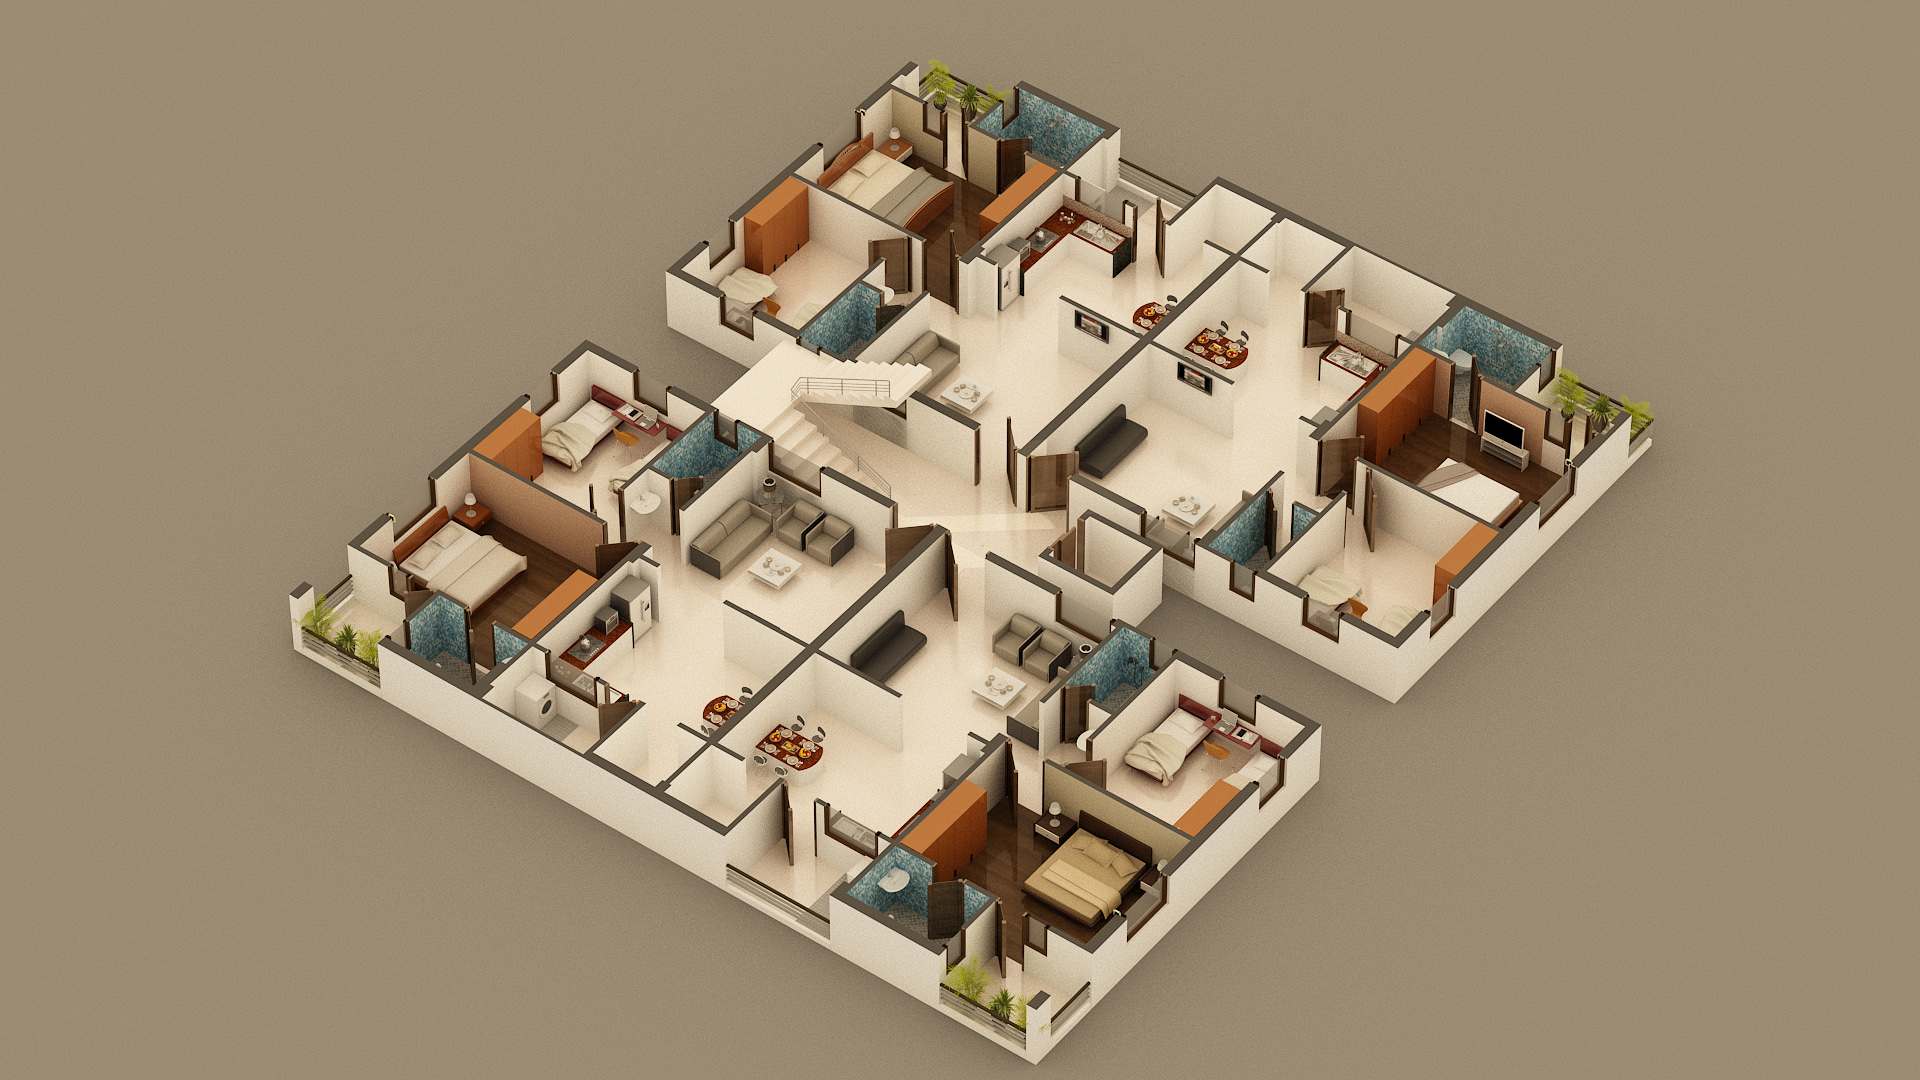 3D Isometric/Floor Plan View | Freelancers 3D